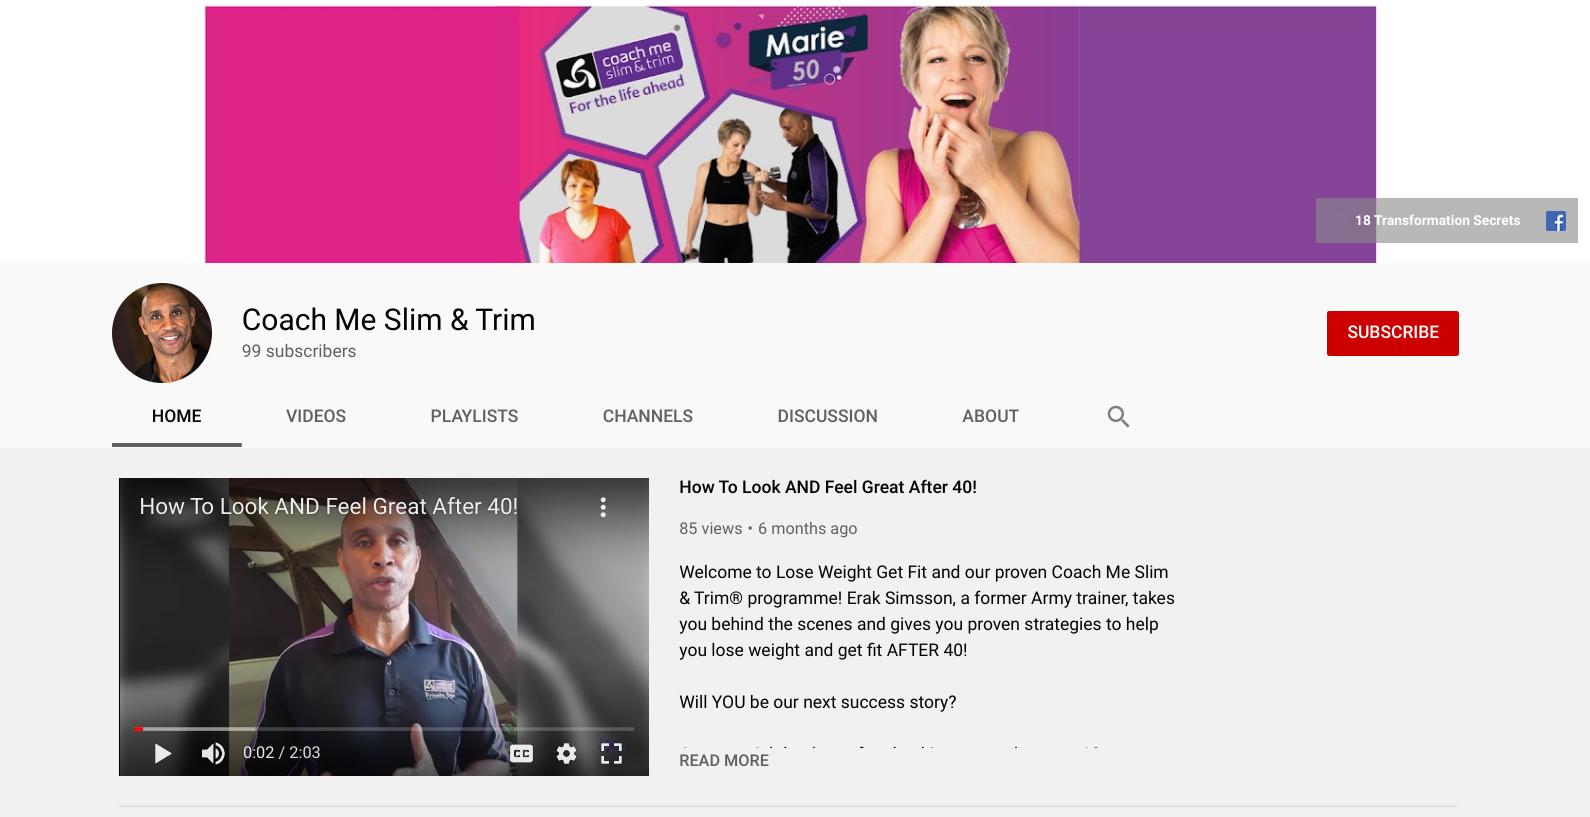 Coach Me Slim & Trim Youtube